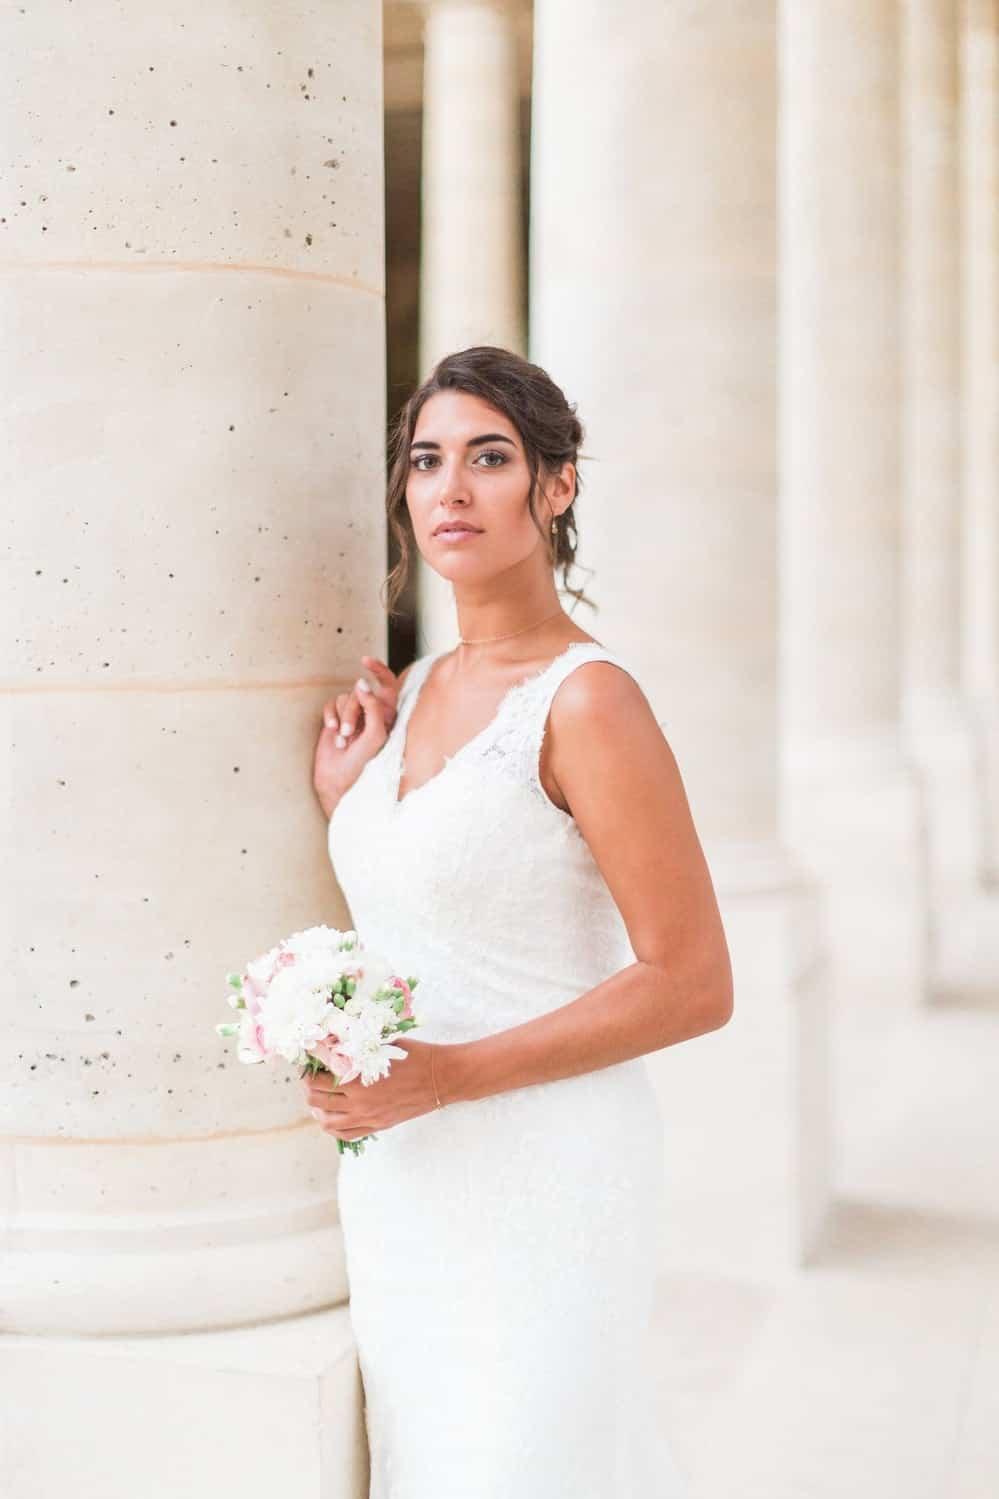 photographe-mariage-toulouse-fine-art-31